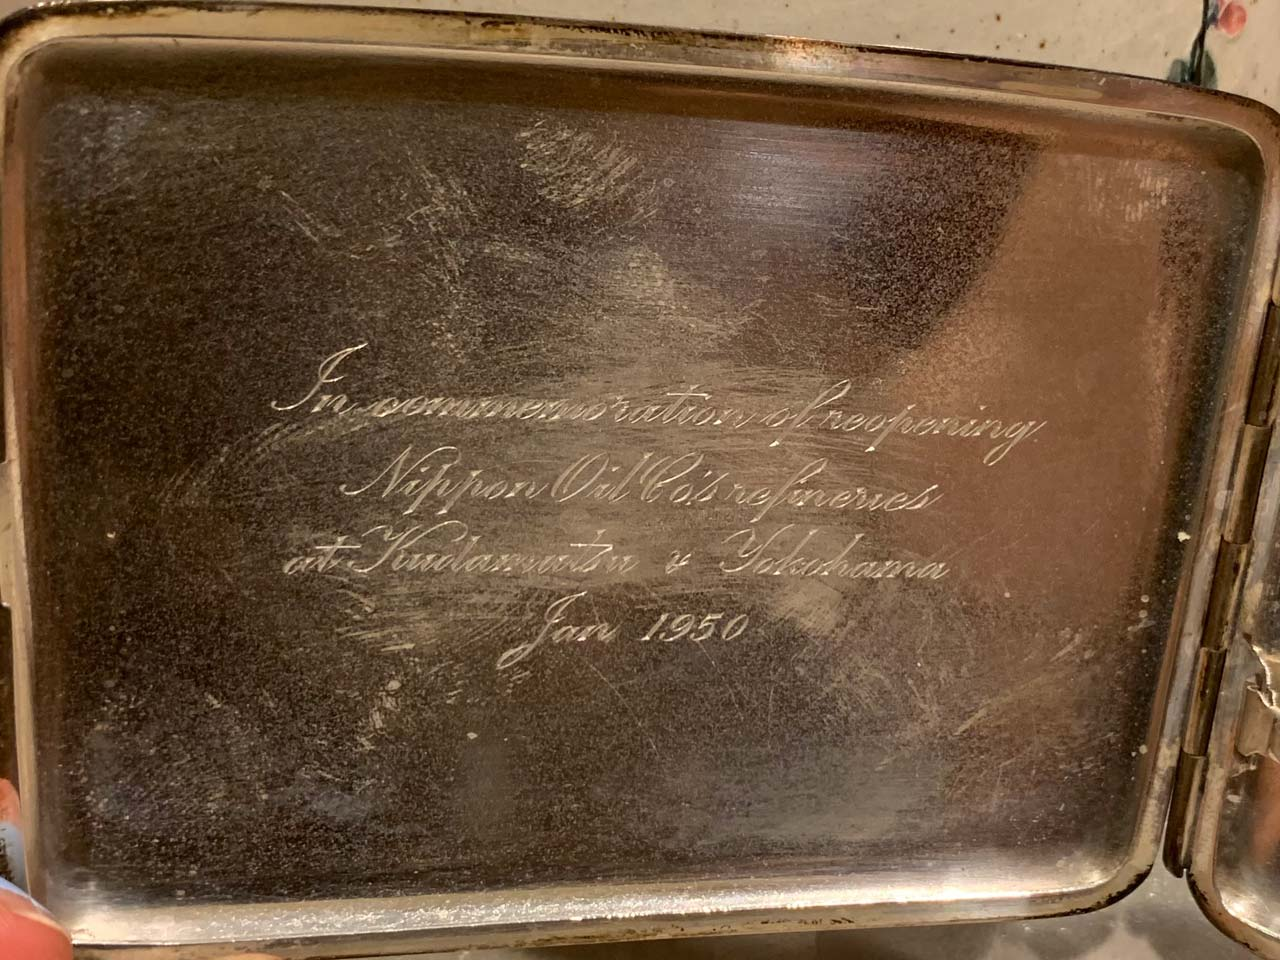 Commemorative gift from Japan's Nippon Oil Company Refineries, Yokohama, Kudamatsu.